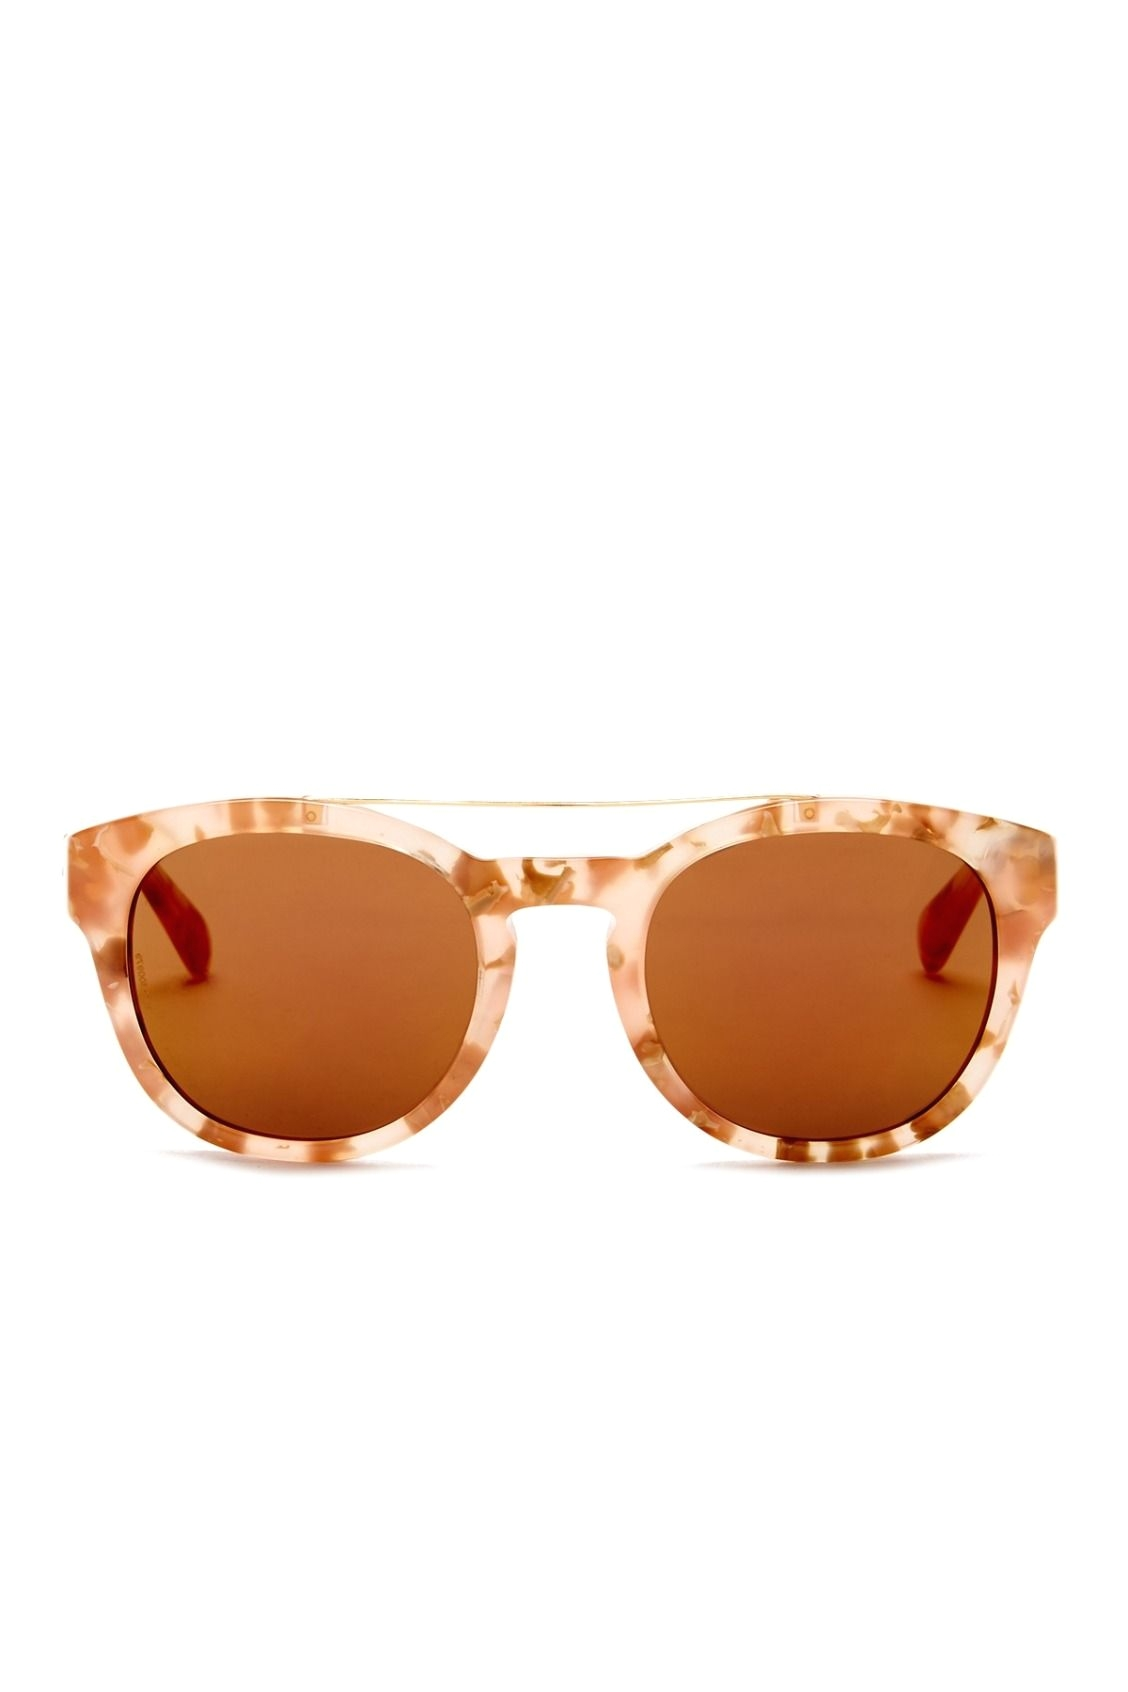 Cole Haan Sunglasses nordstrom Rack Love these Dolce Gabbana Women S Urban Essential Round Brow Bar